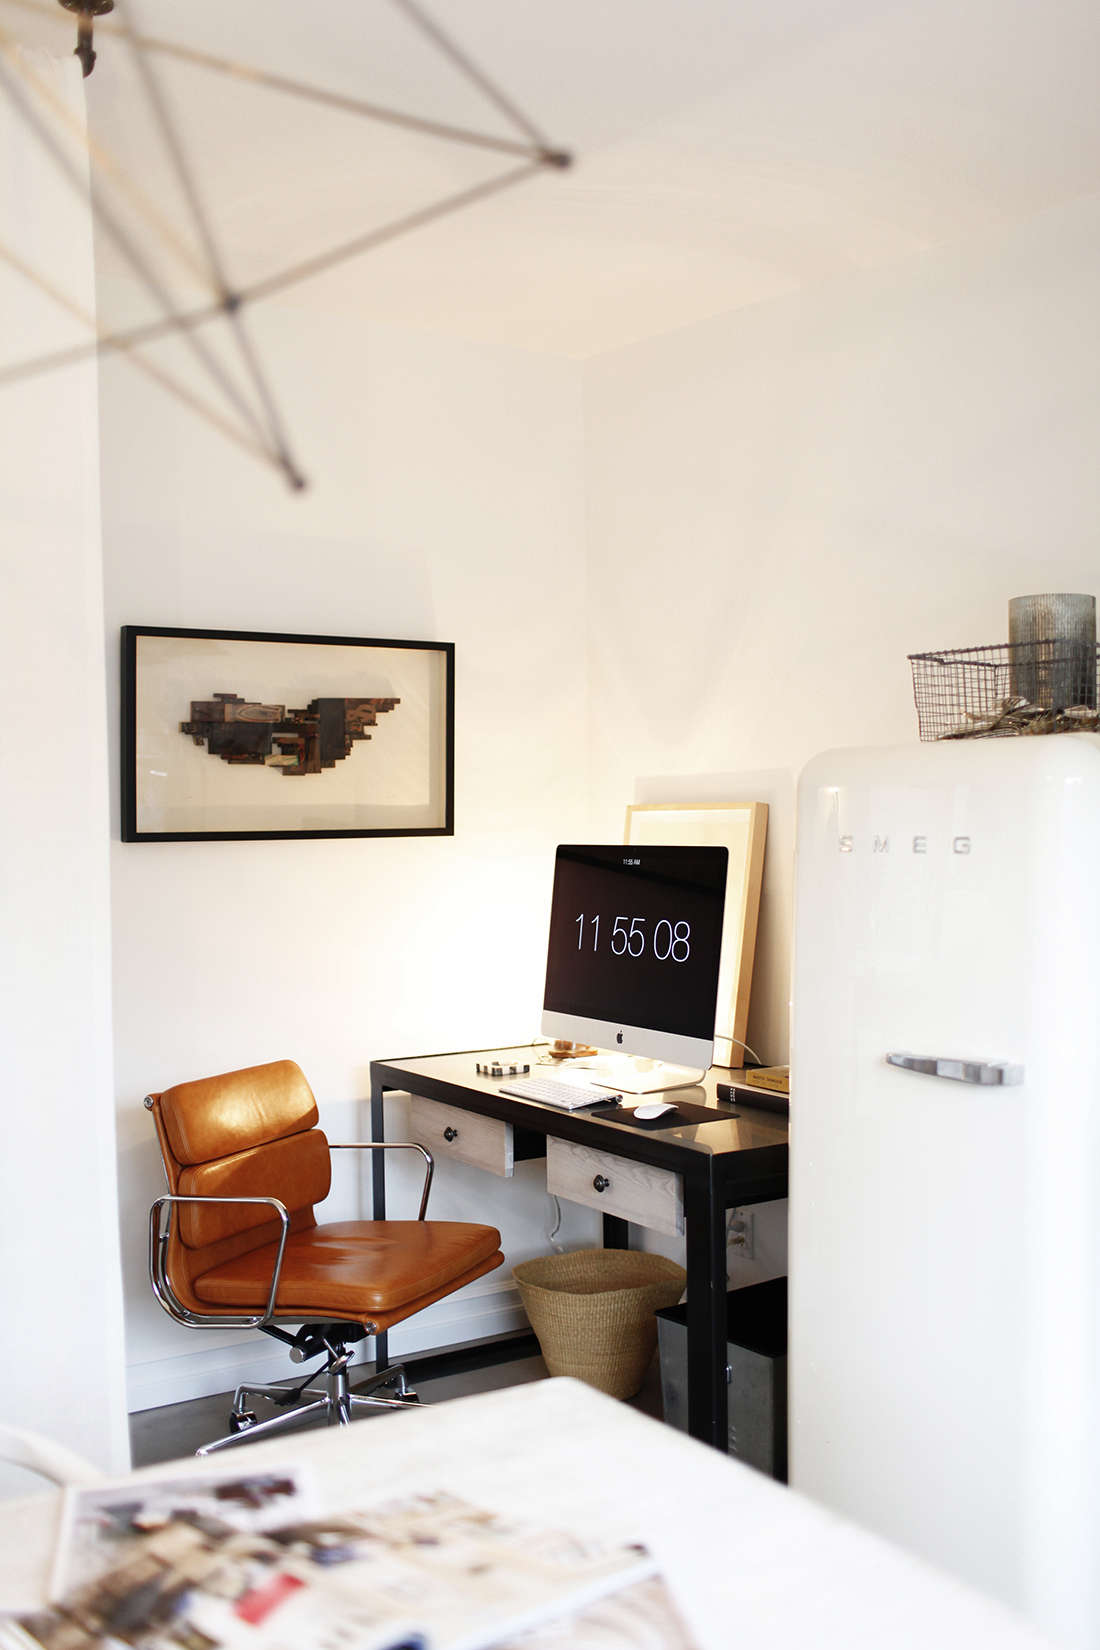 h2 design + build office in seattle | remodelista 16